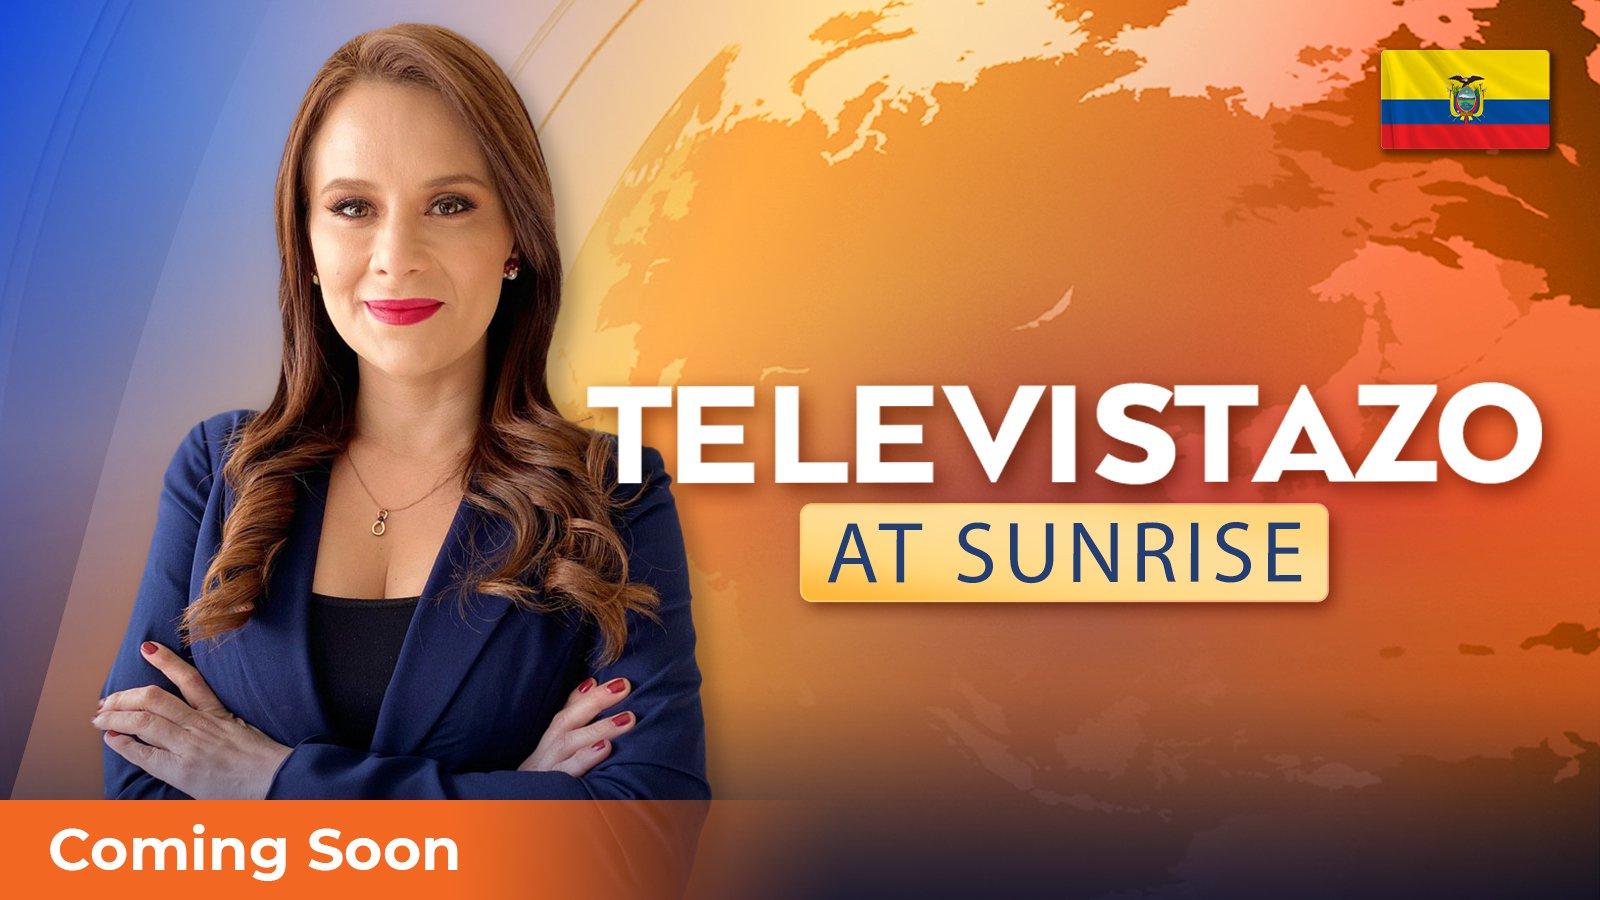 Televistazo At Sunrise poster